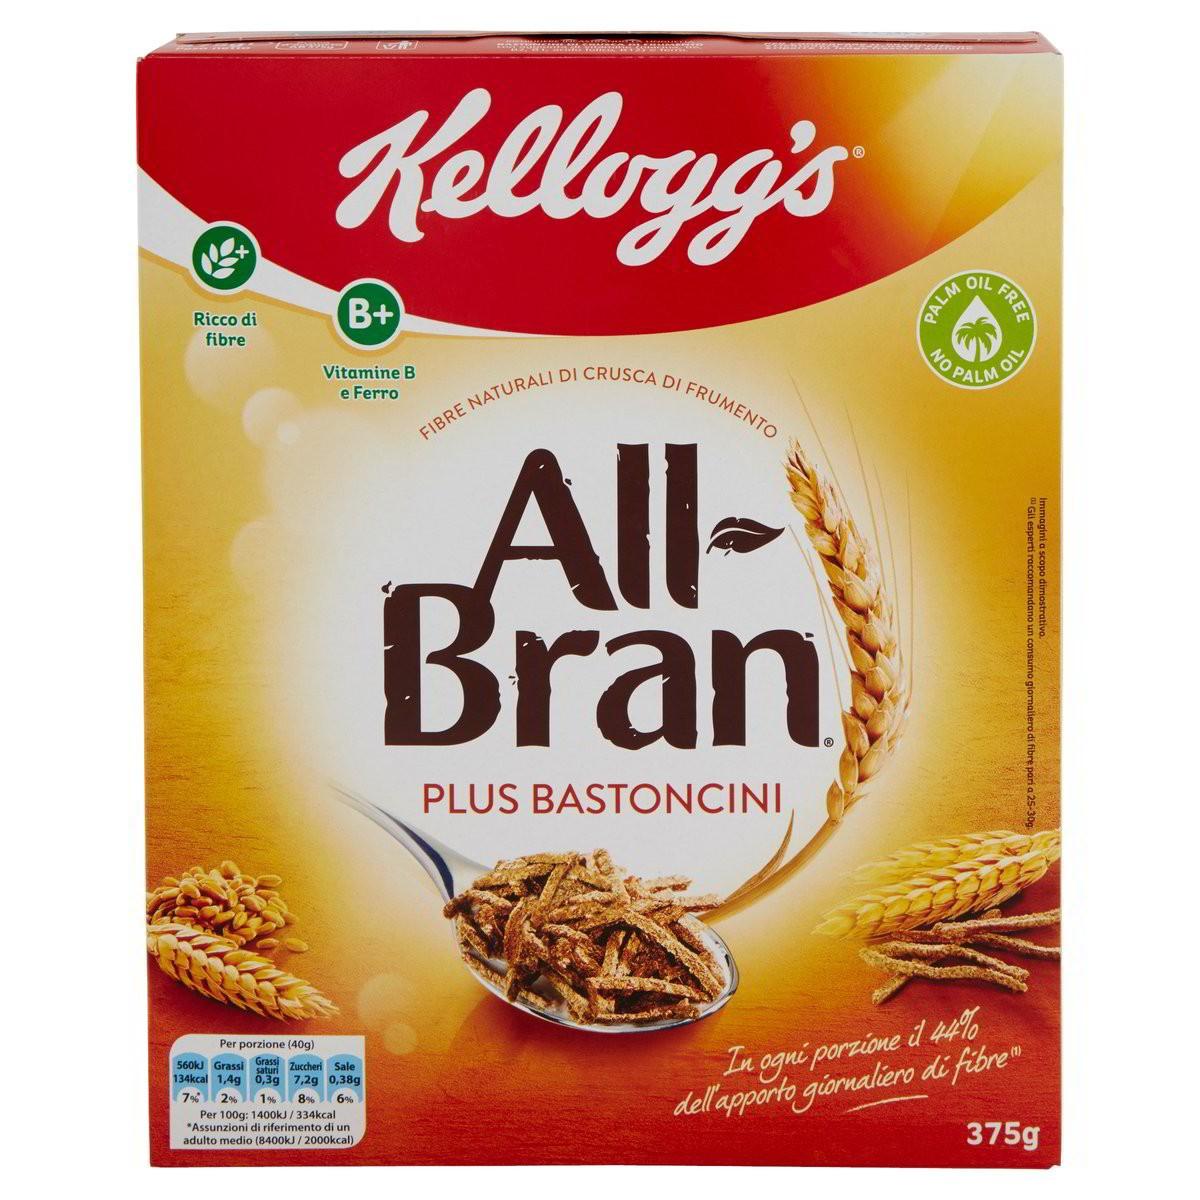 All Bran Plus Bastoncini